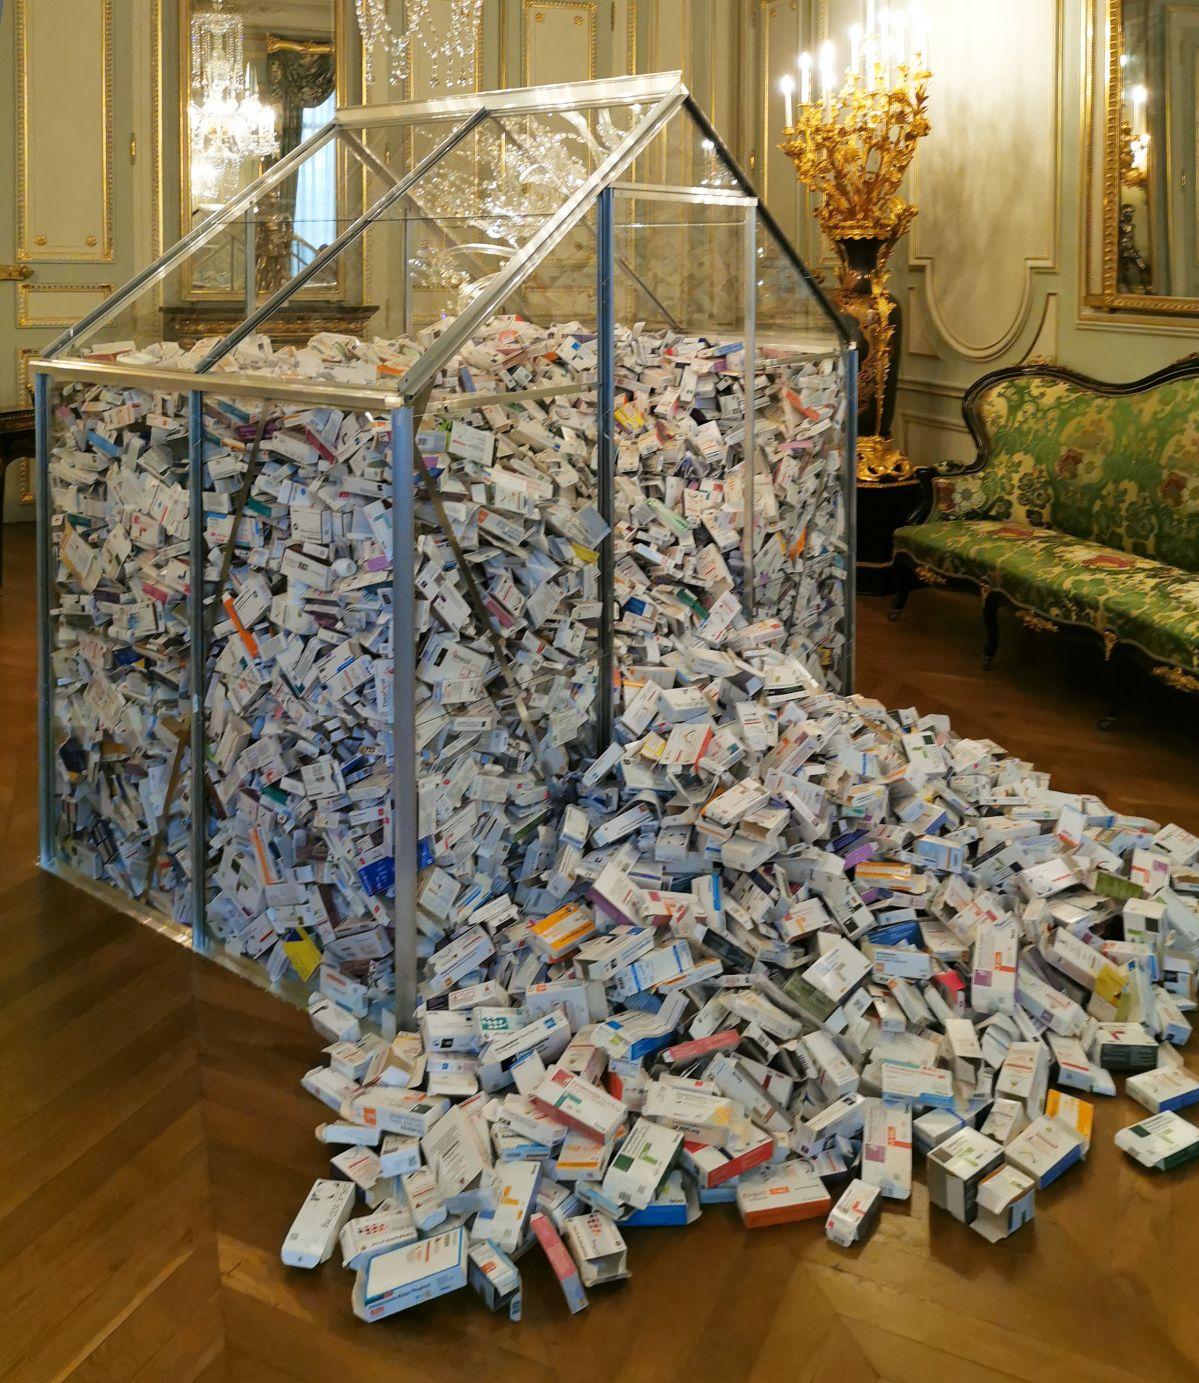 Jeanne Susplugas - La Maison malade,2020 - Pharmacopées au Musée Fabre